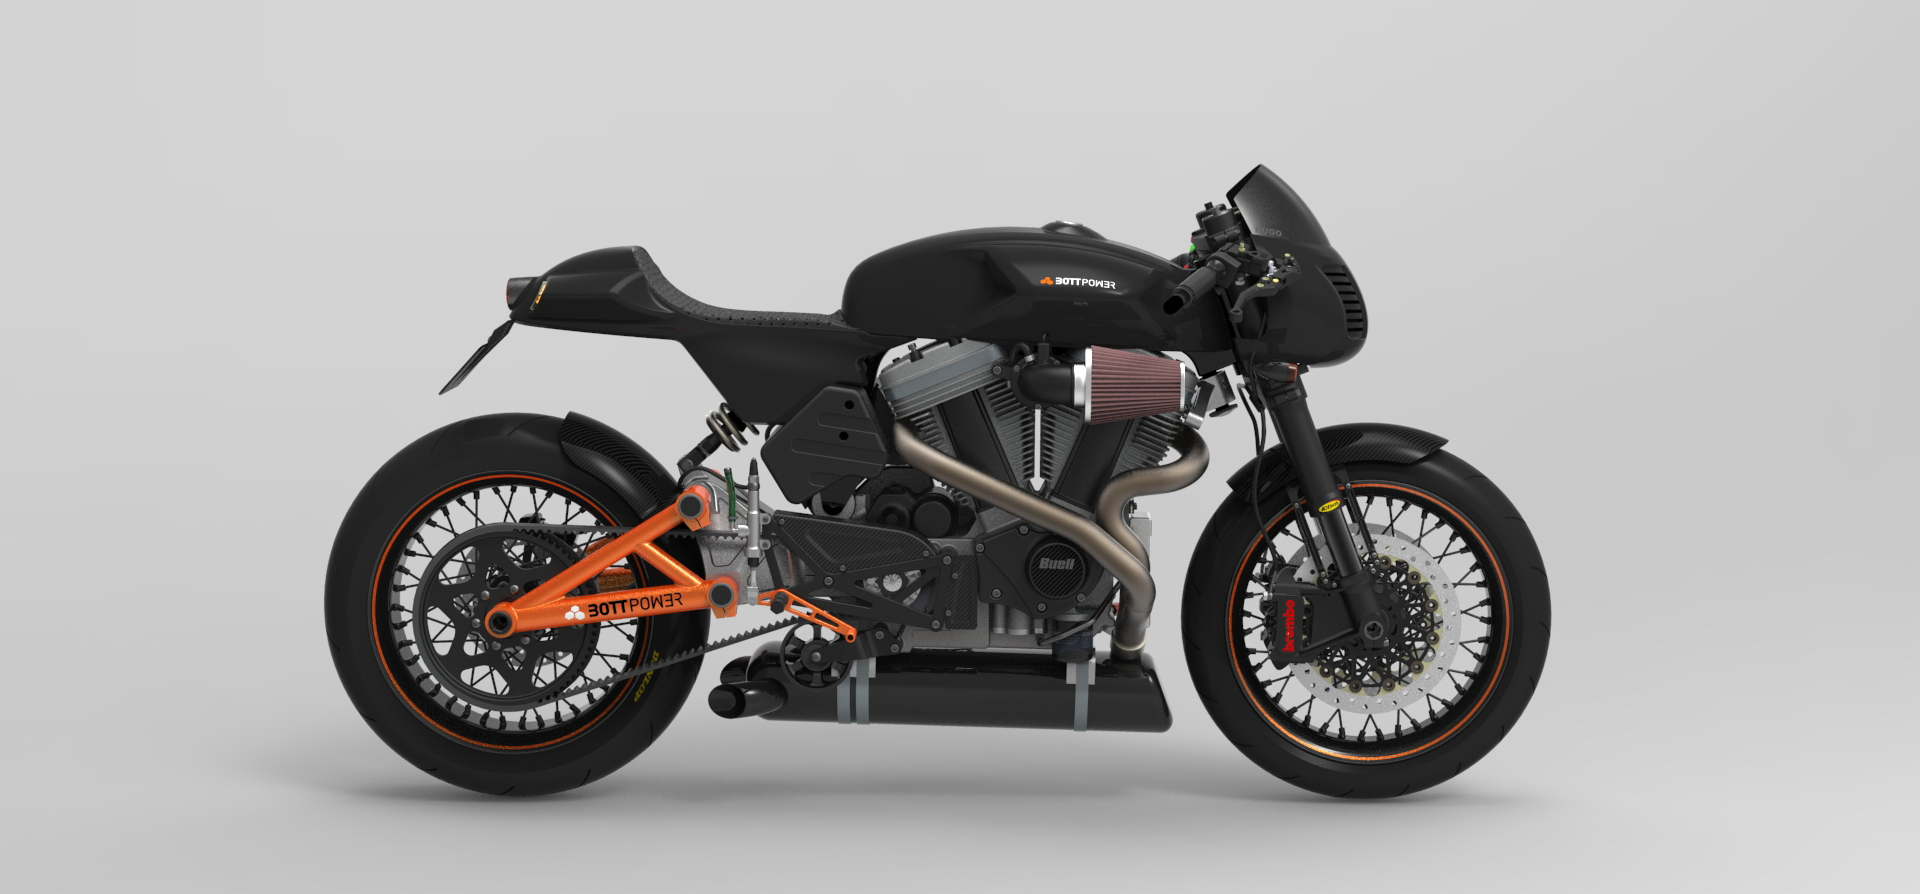 Bottpower Cafe-Racer New Rendering Surfaces - autoevolution